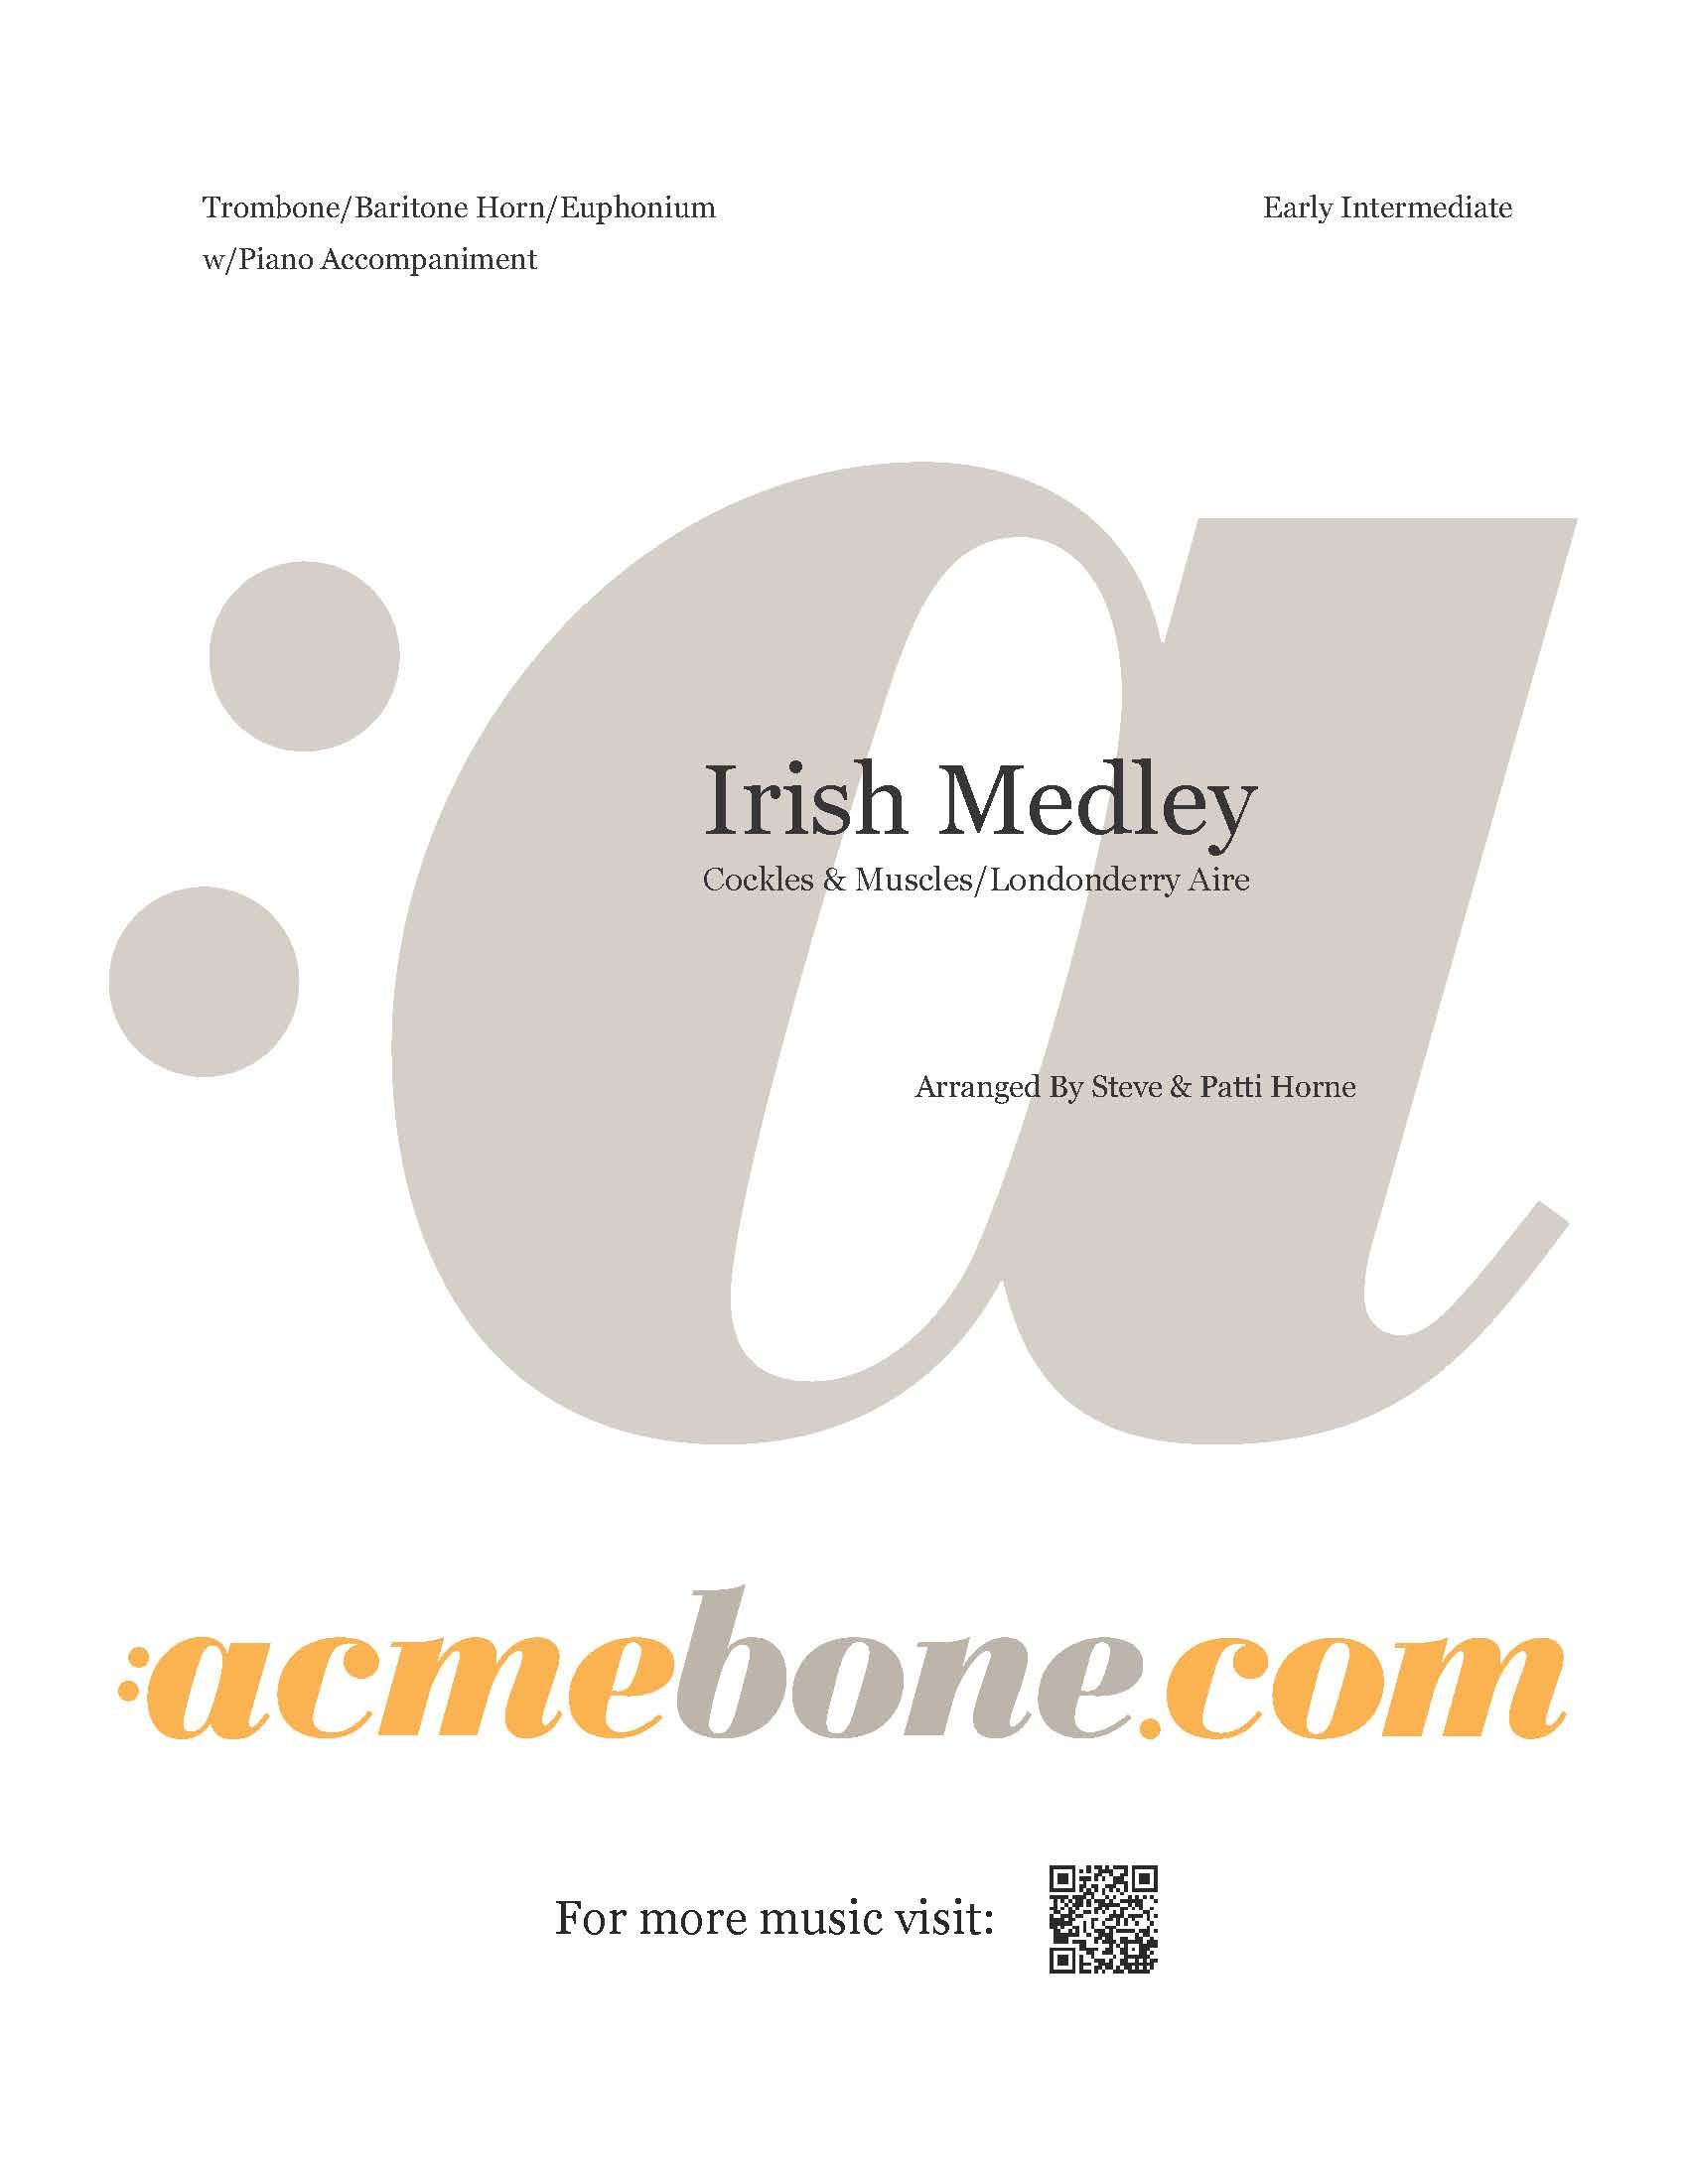 Irish Medley_download_from_acmebone.com_Page_1.jpg